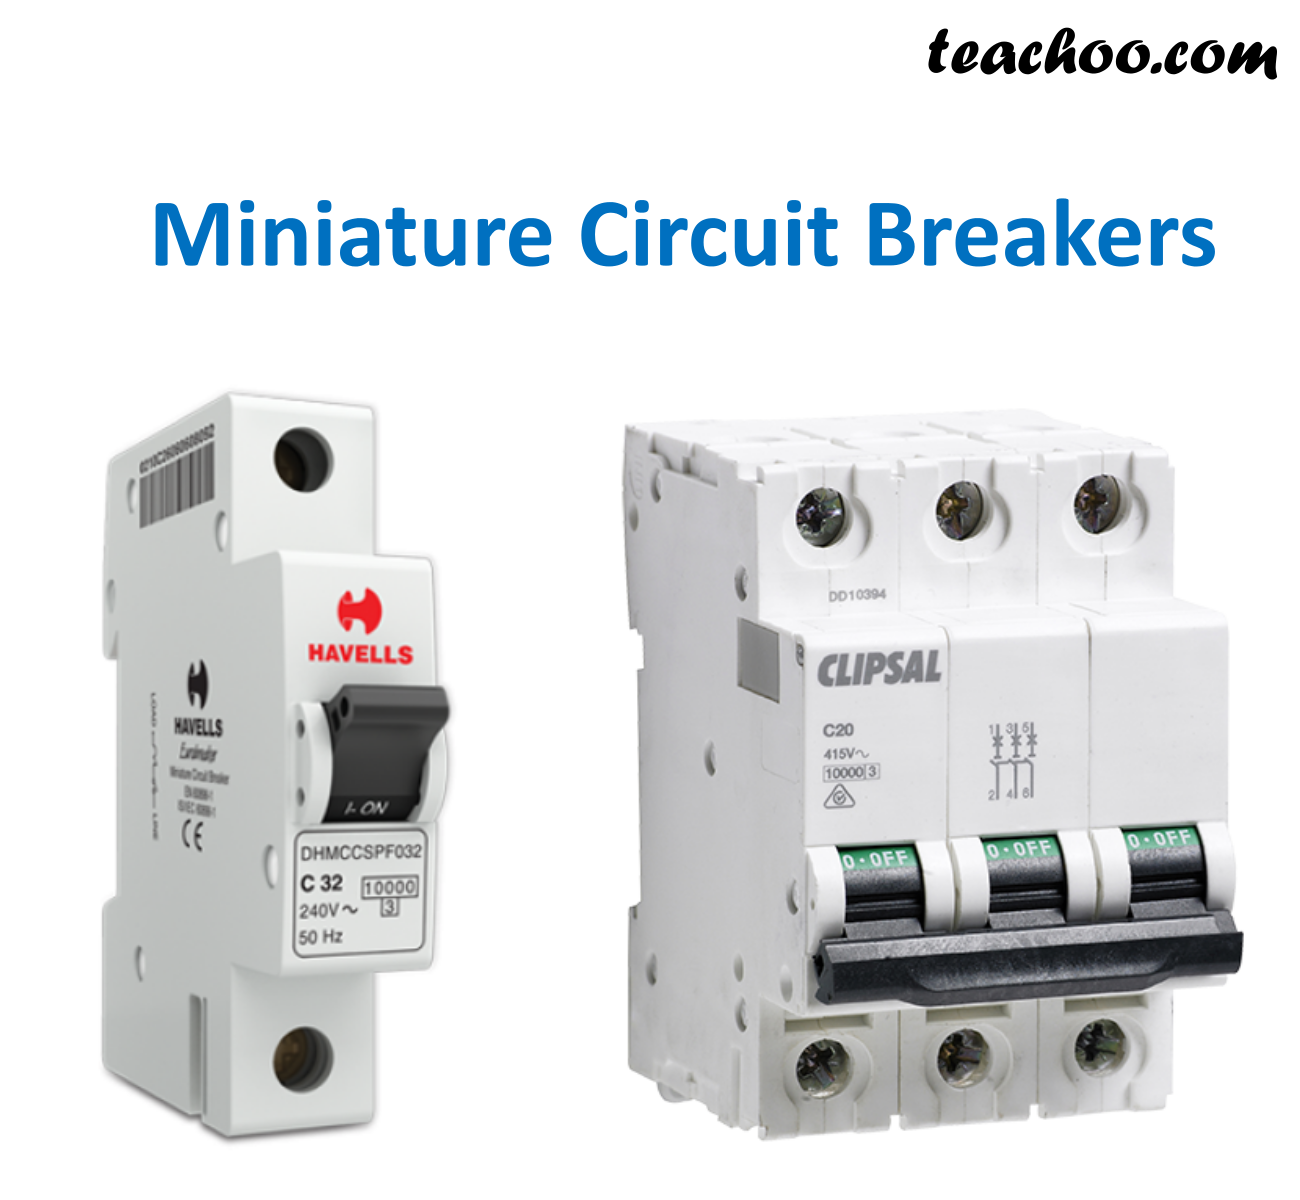 Miniature Circuit Breakers (MCB) - Teachoo.png